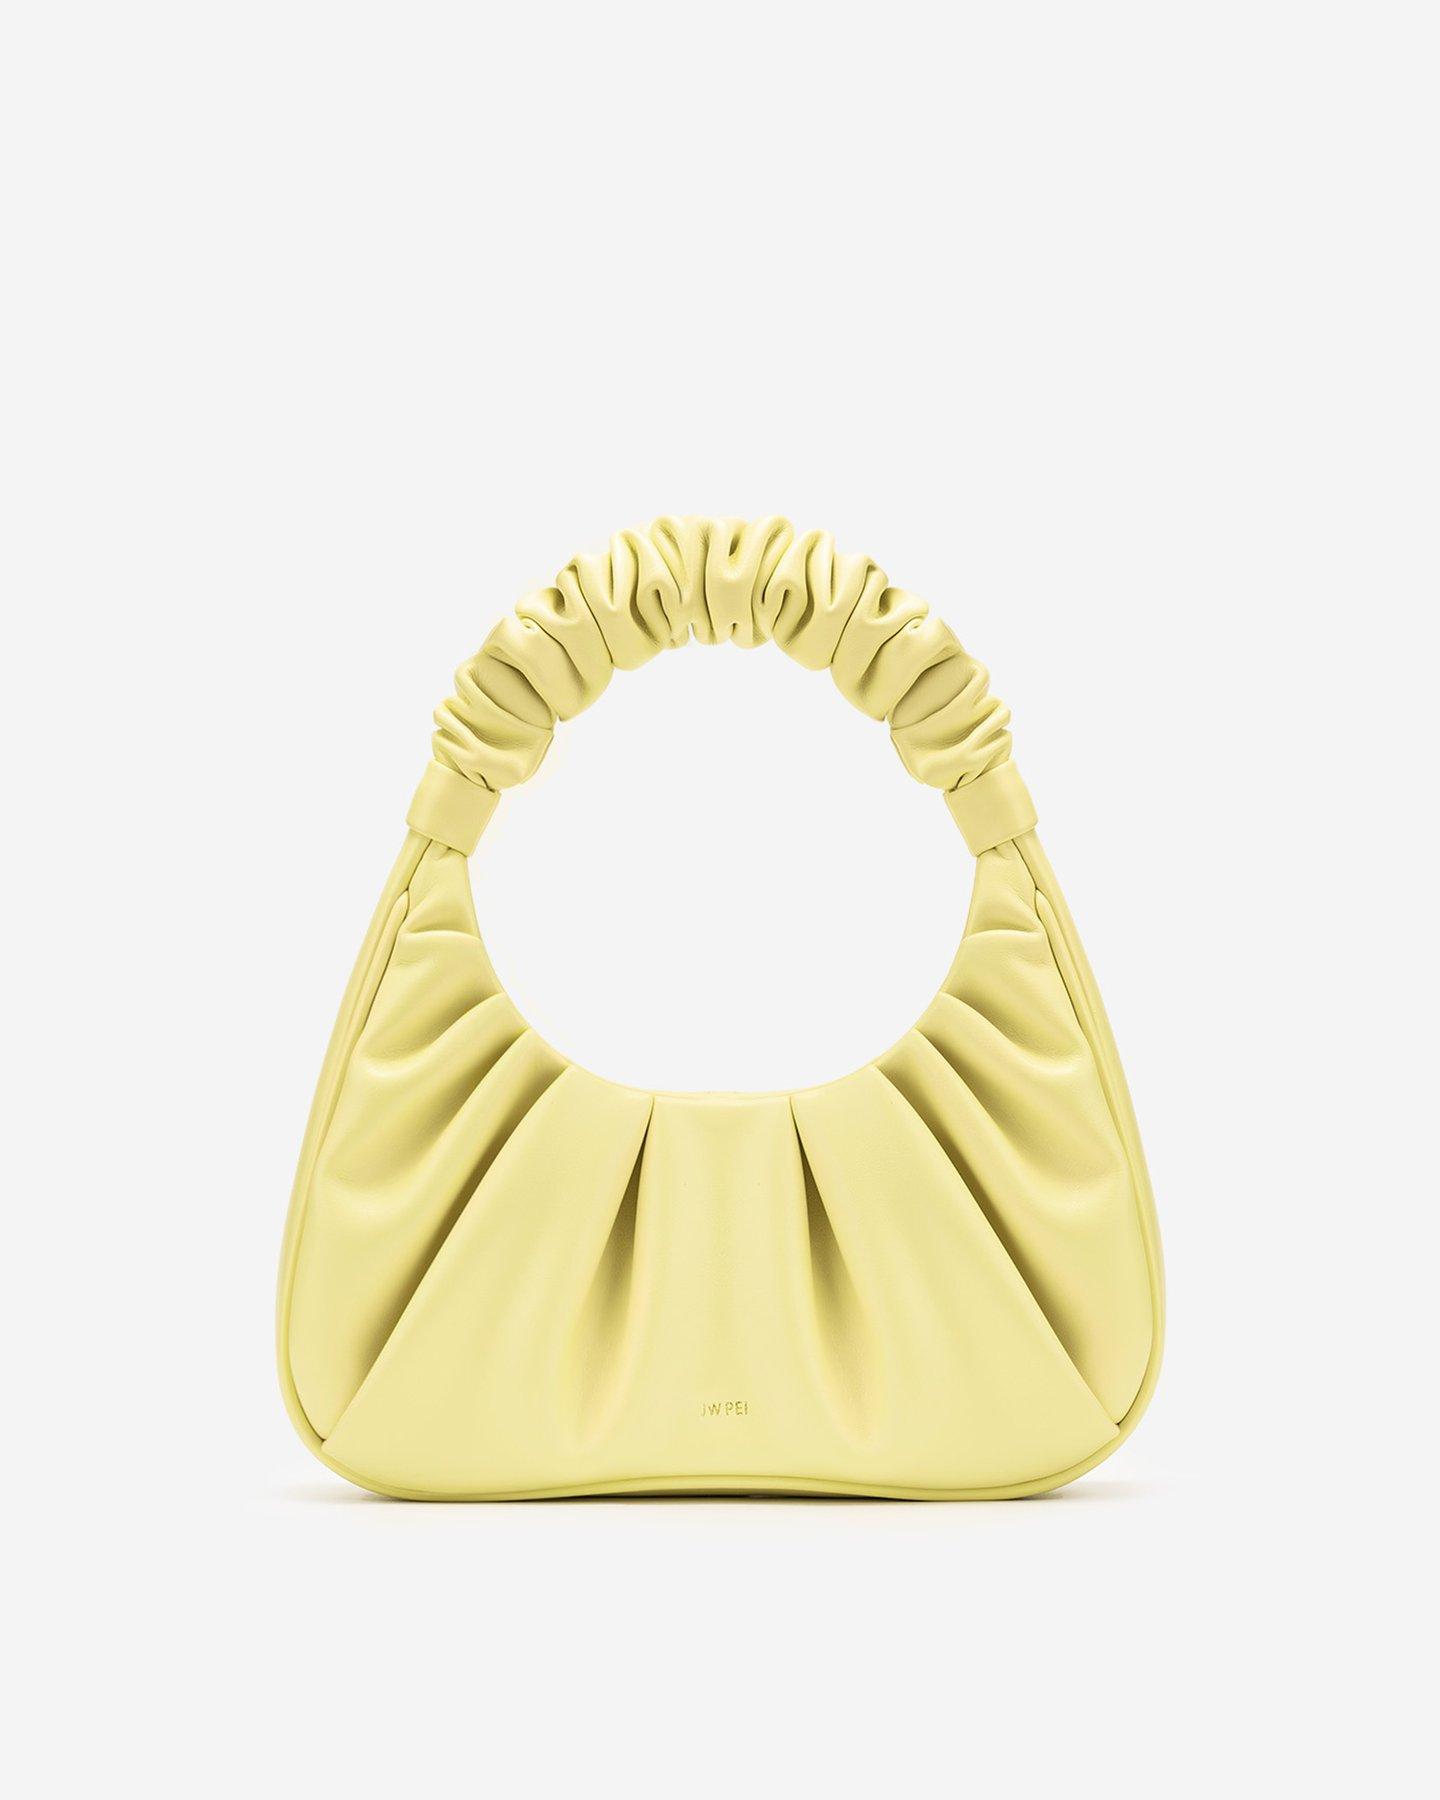 Gabbi Bag - Light Yellow by Jw Pei, available on jwpei.com for $58 Gigi Hadid Bags Exact Product